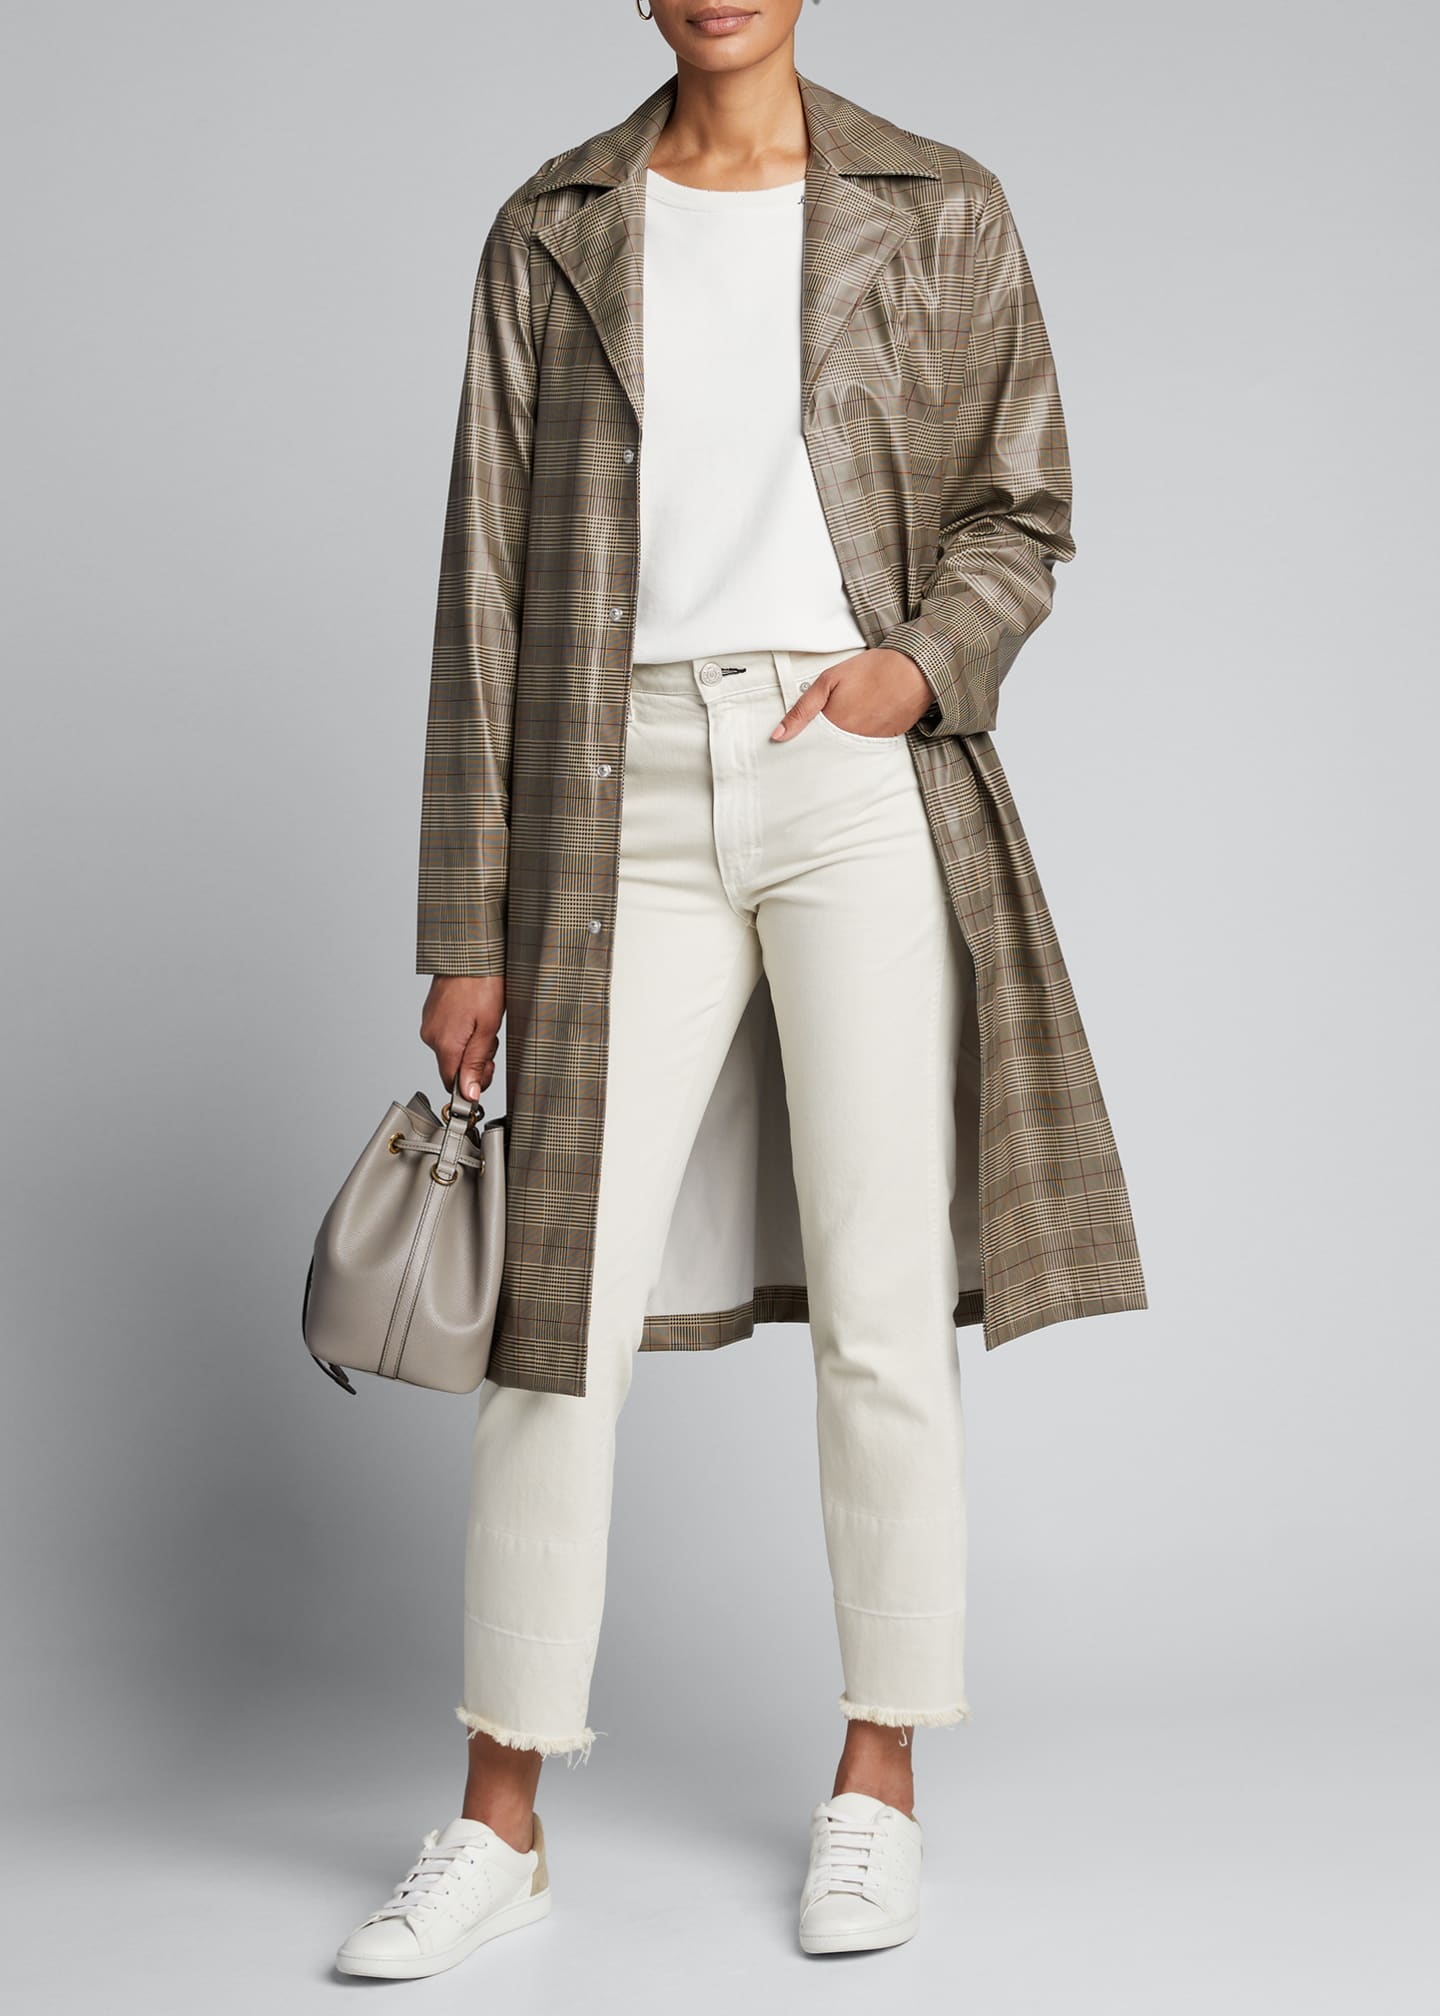 Rains Check Waterproof Overcoat